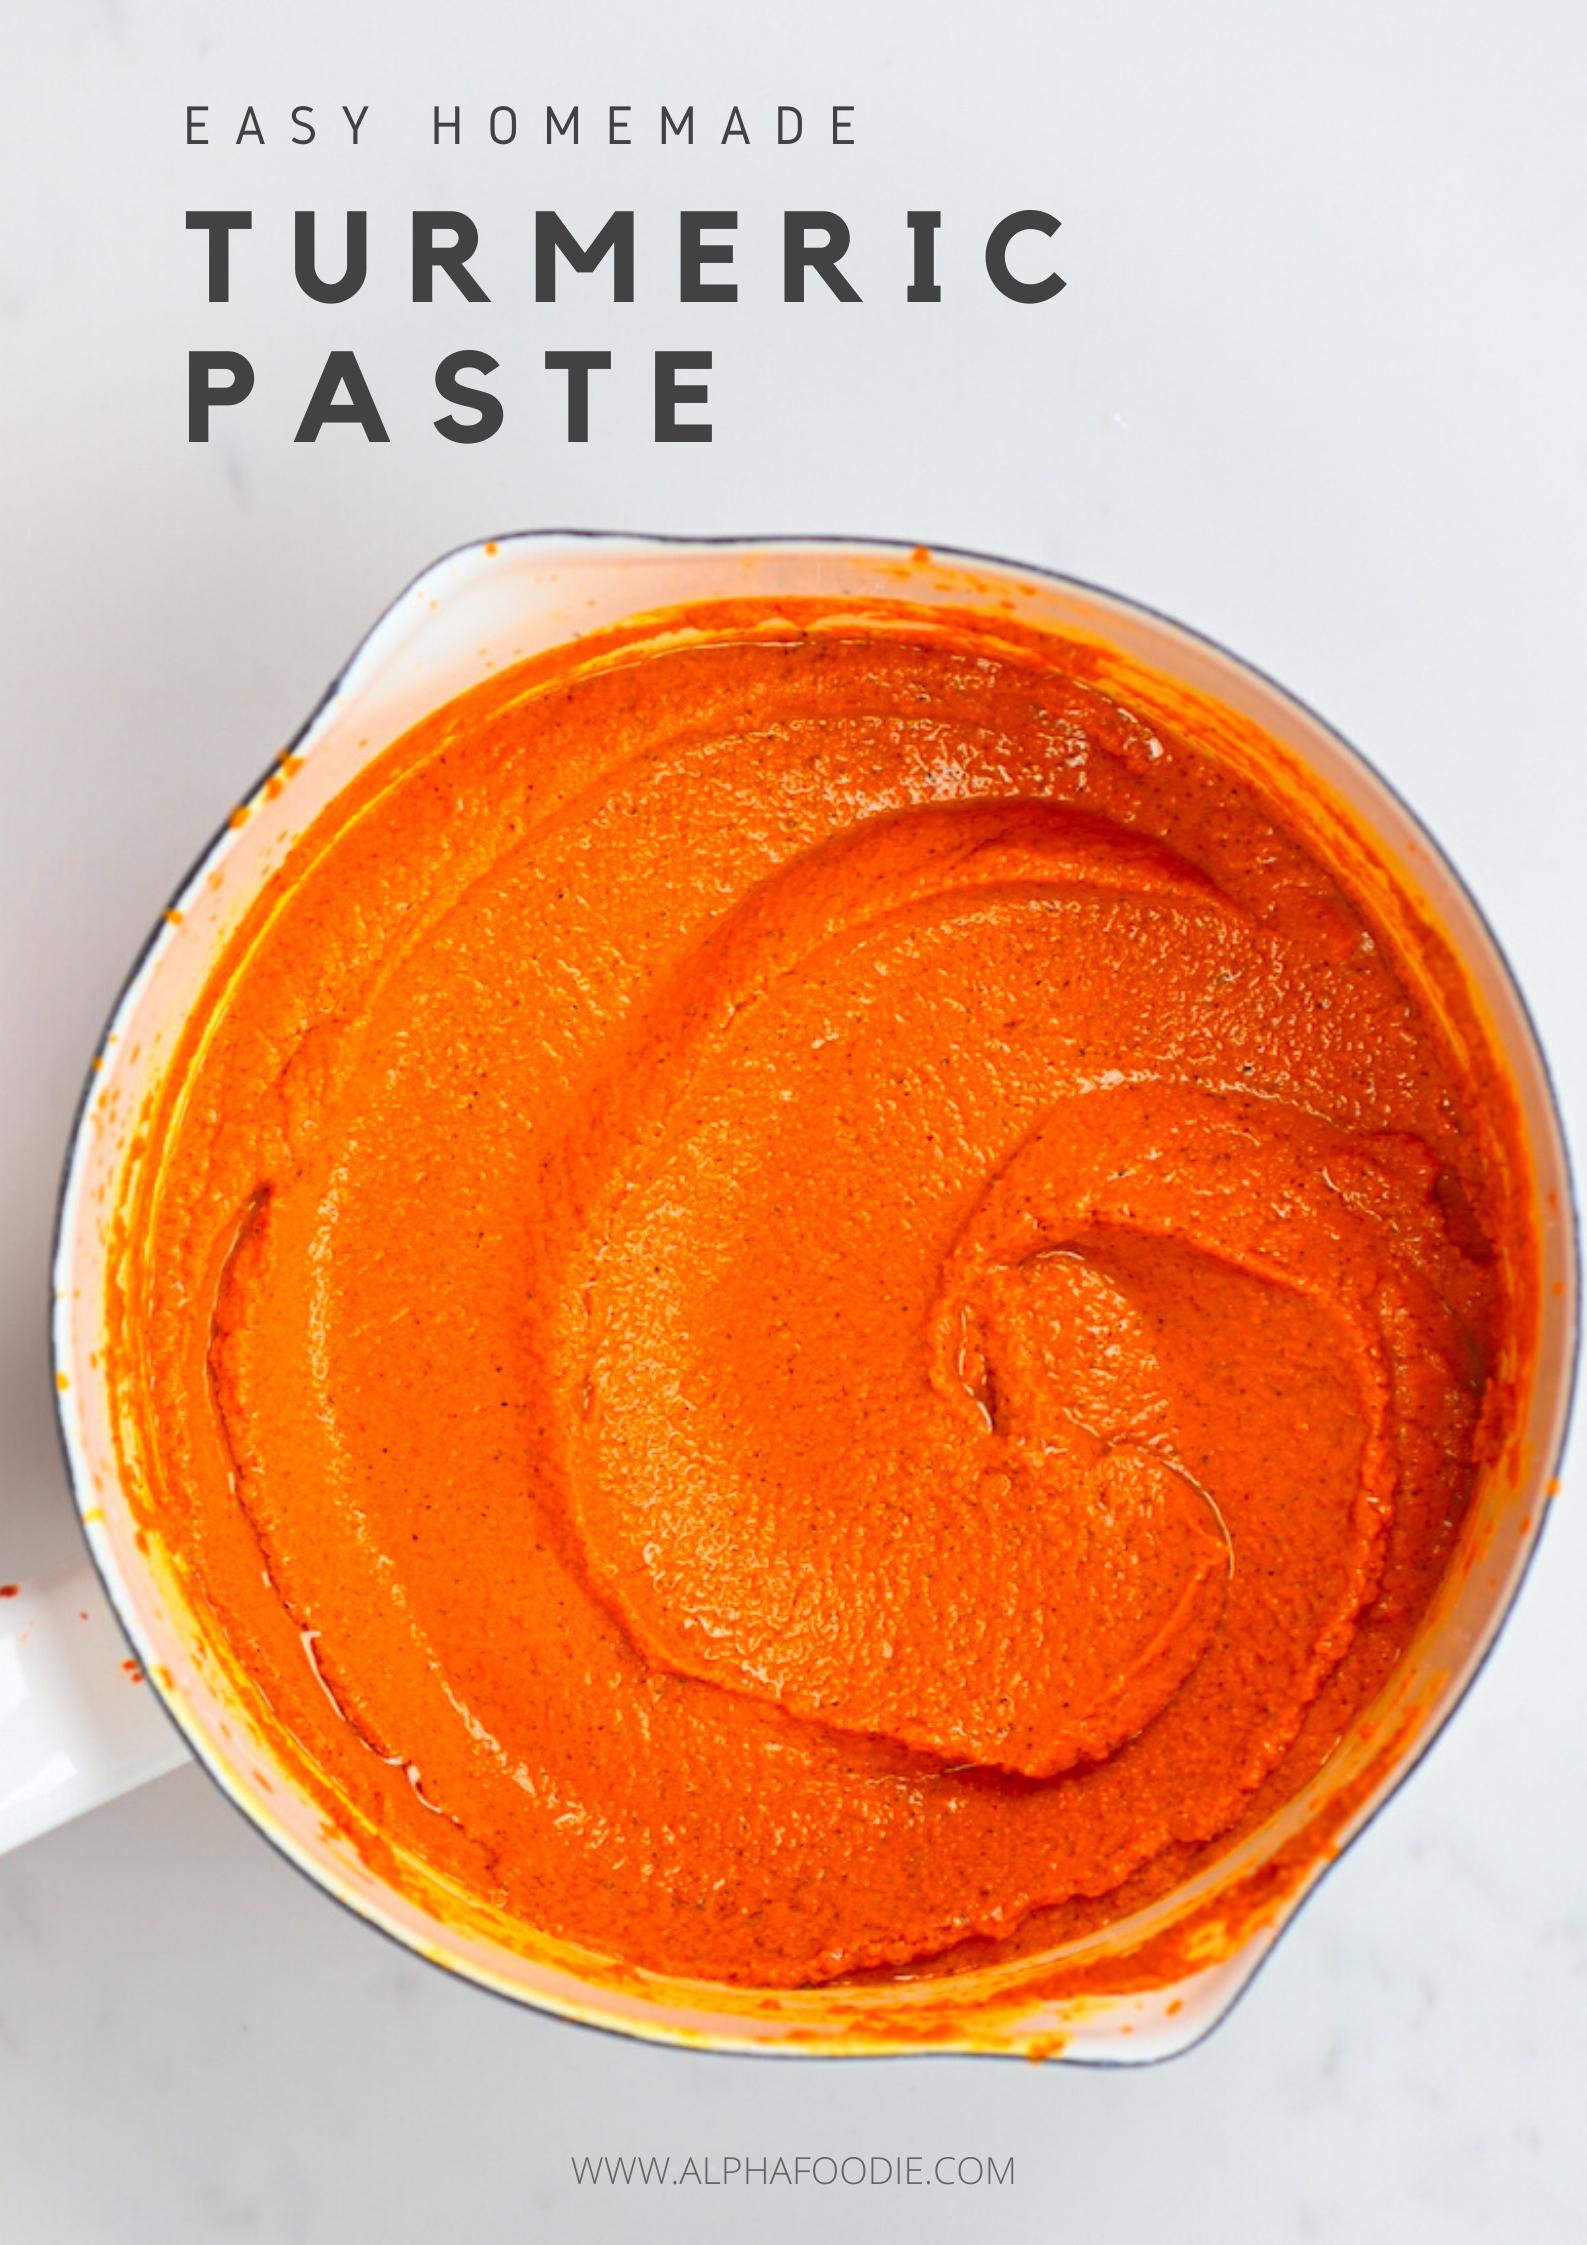 Simple Turmeric Paste Golden Paste Recipe Turmeric Paste Turmeric Golden Paste